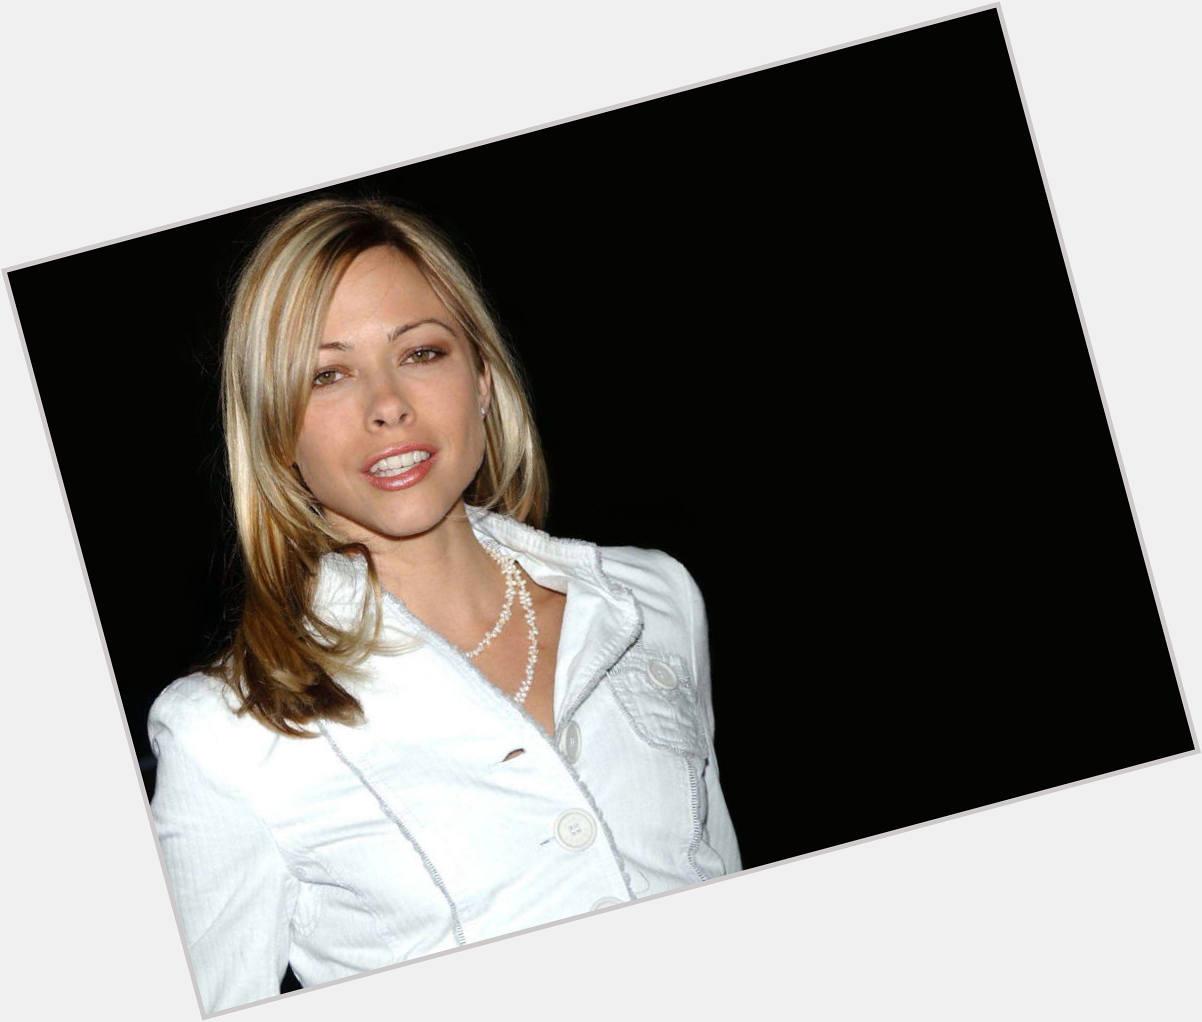 Cheryl Hines born September 21, 1965 (age 53) Cheryl Hines born September 21, 1965 (age 53) new foto